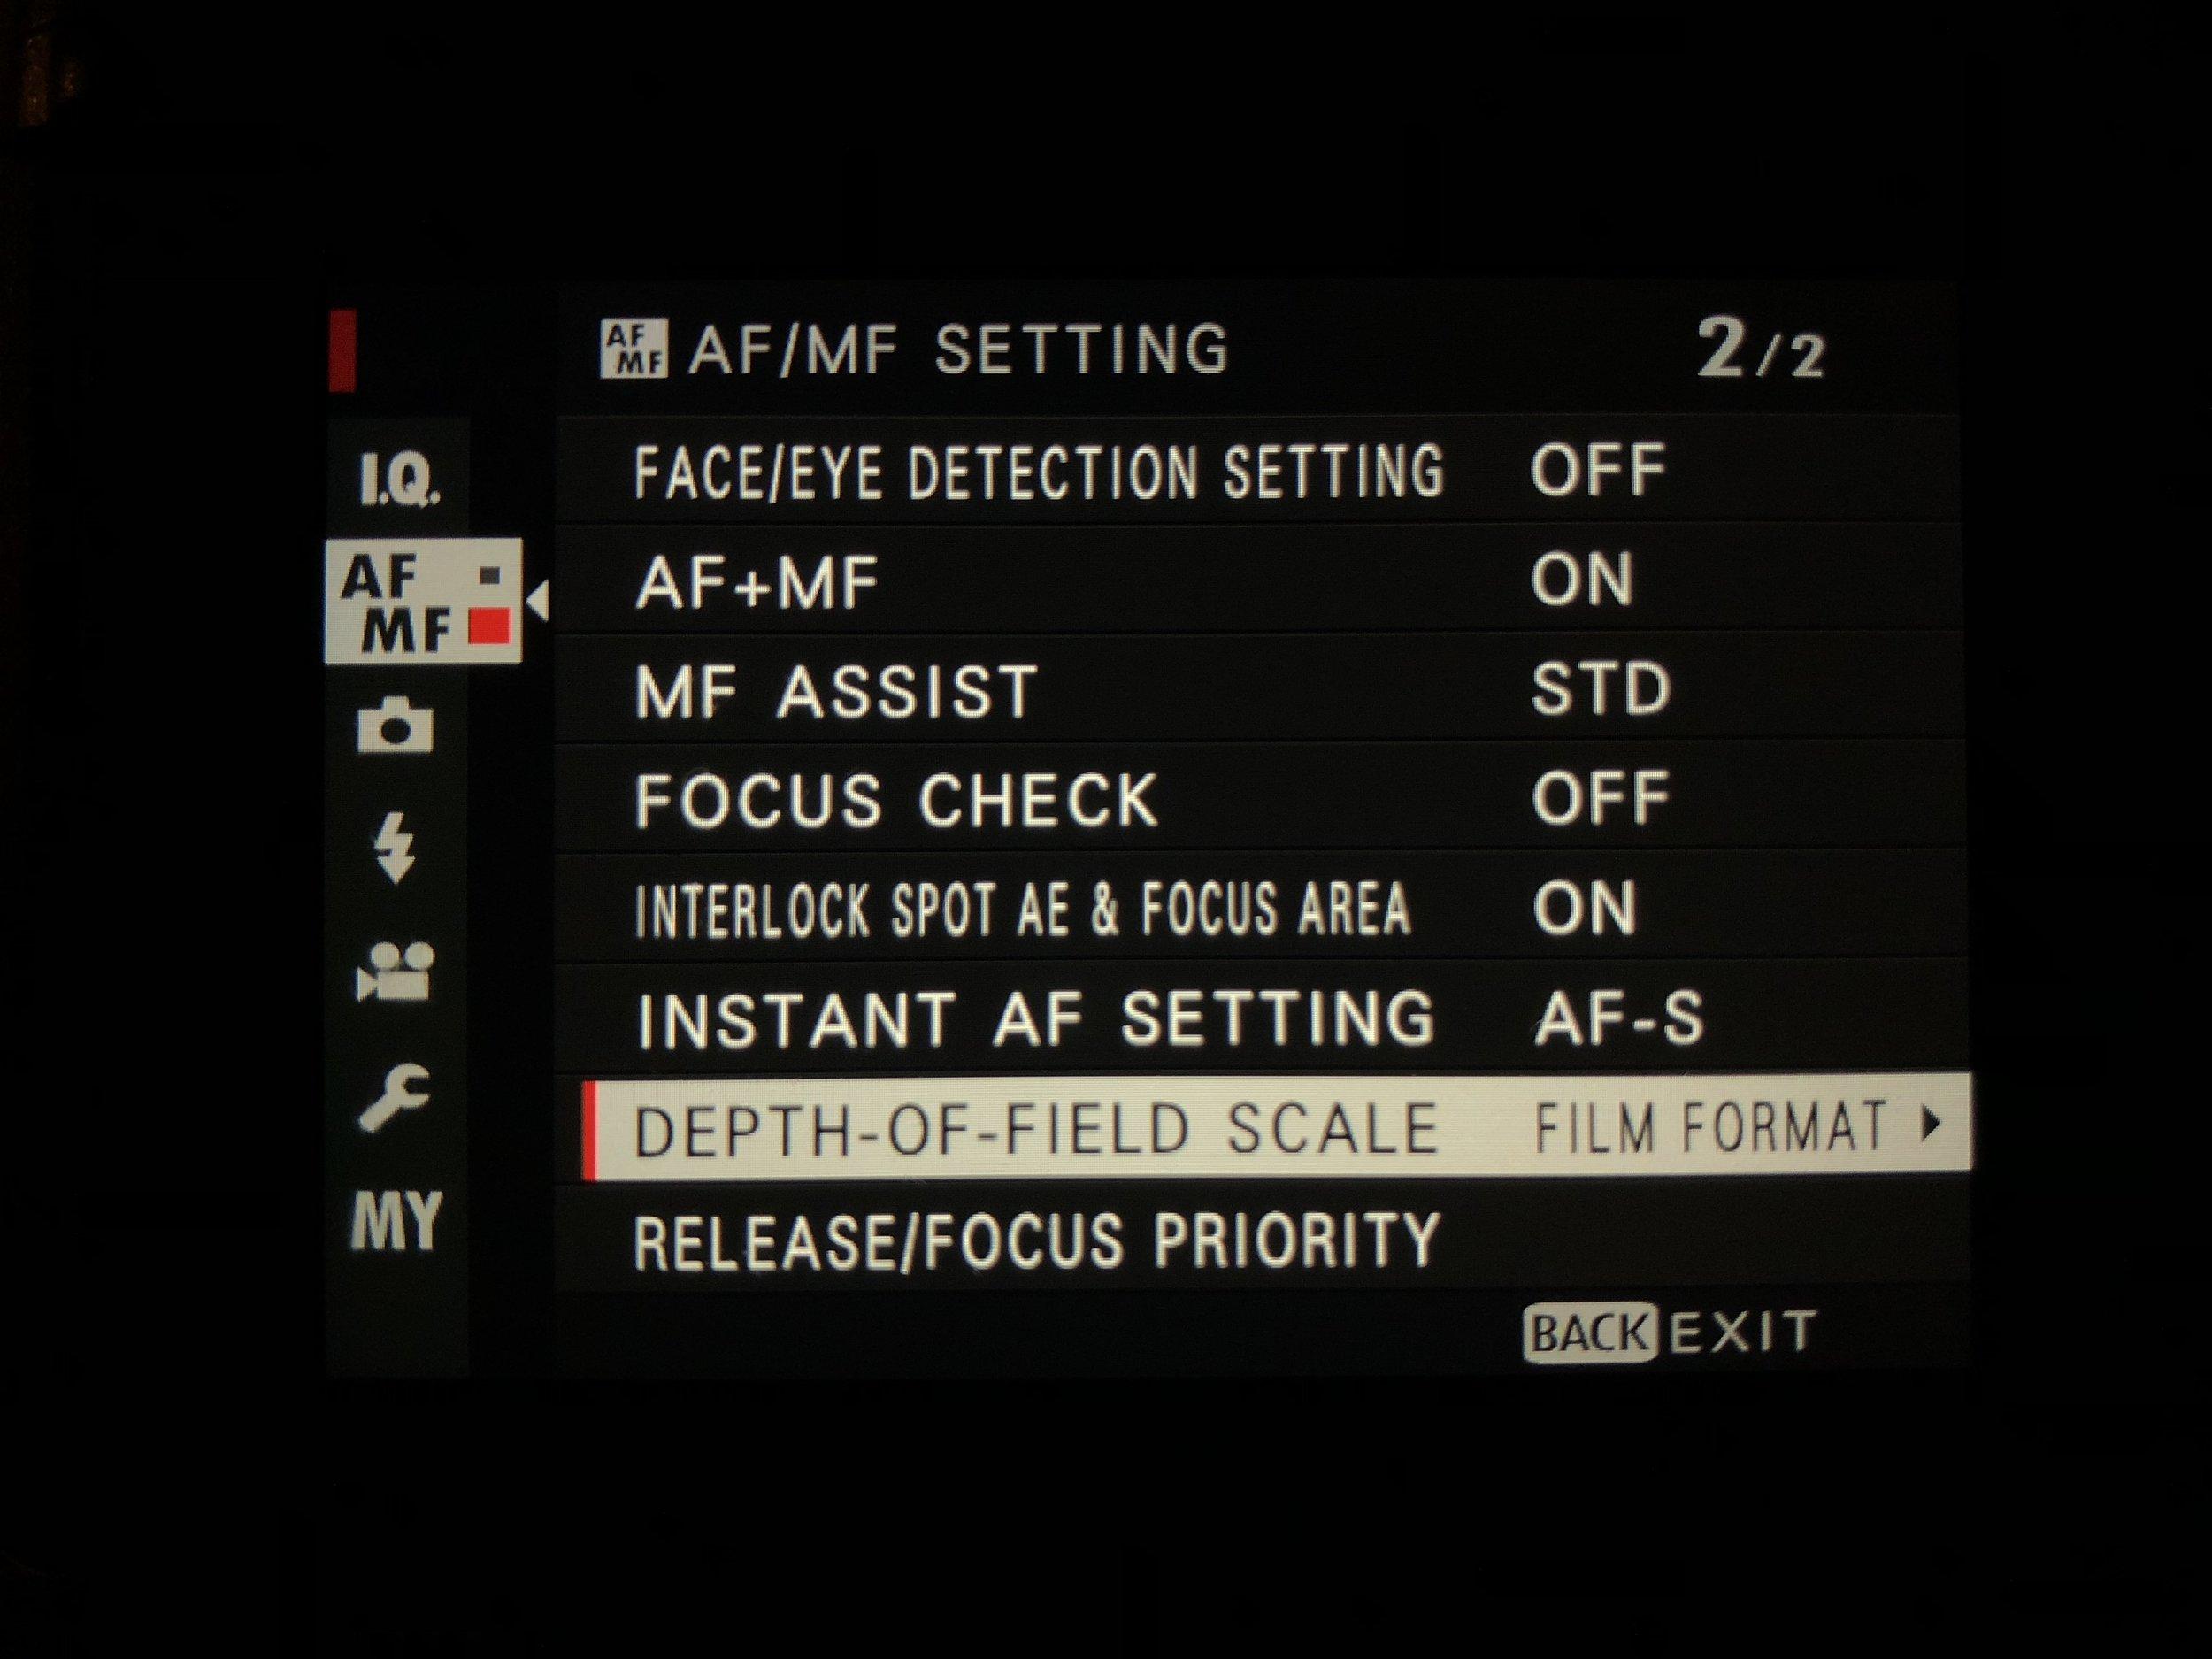 Set DoF Scale - AF/MF Setting menu>Depth-Of-Field Scale>Film Format Basis